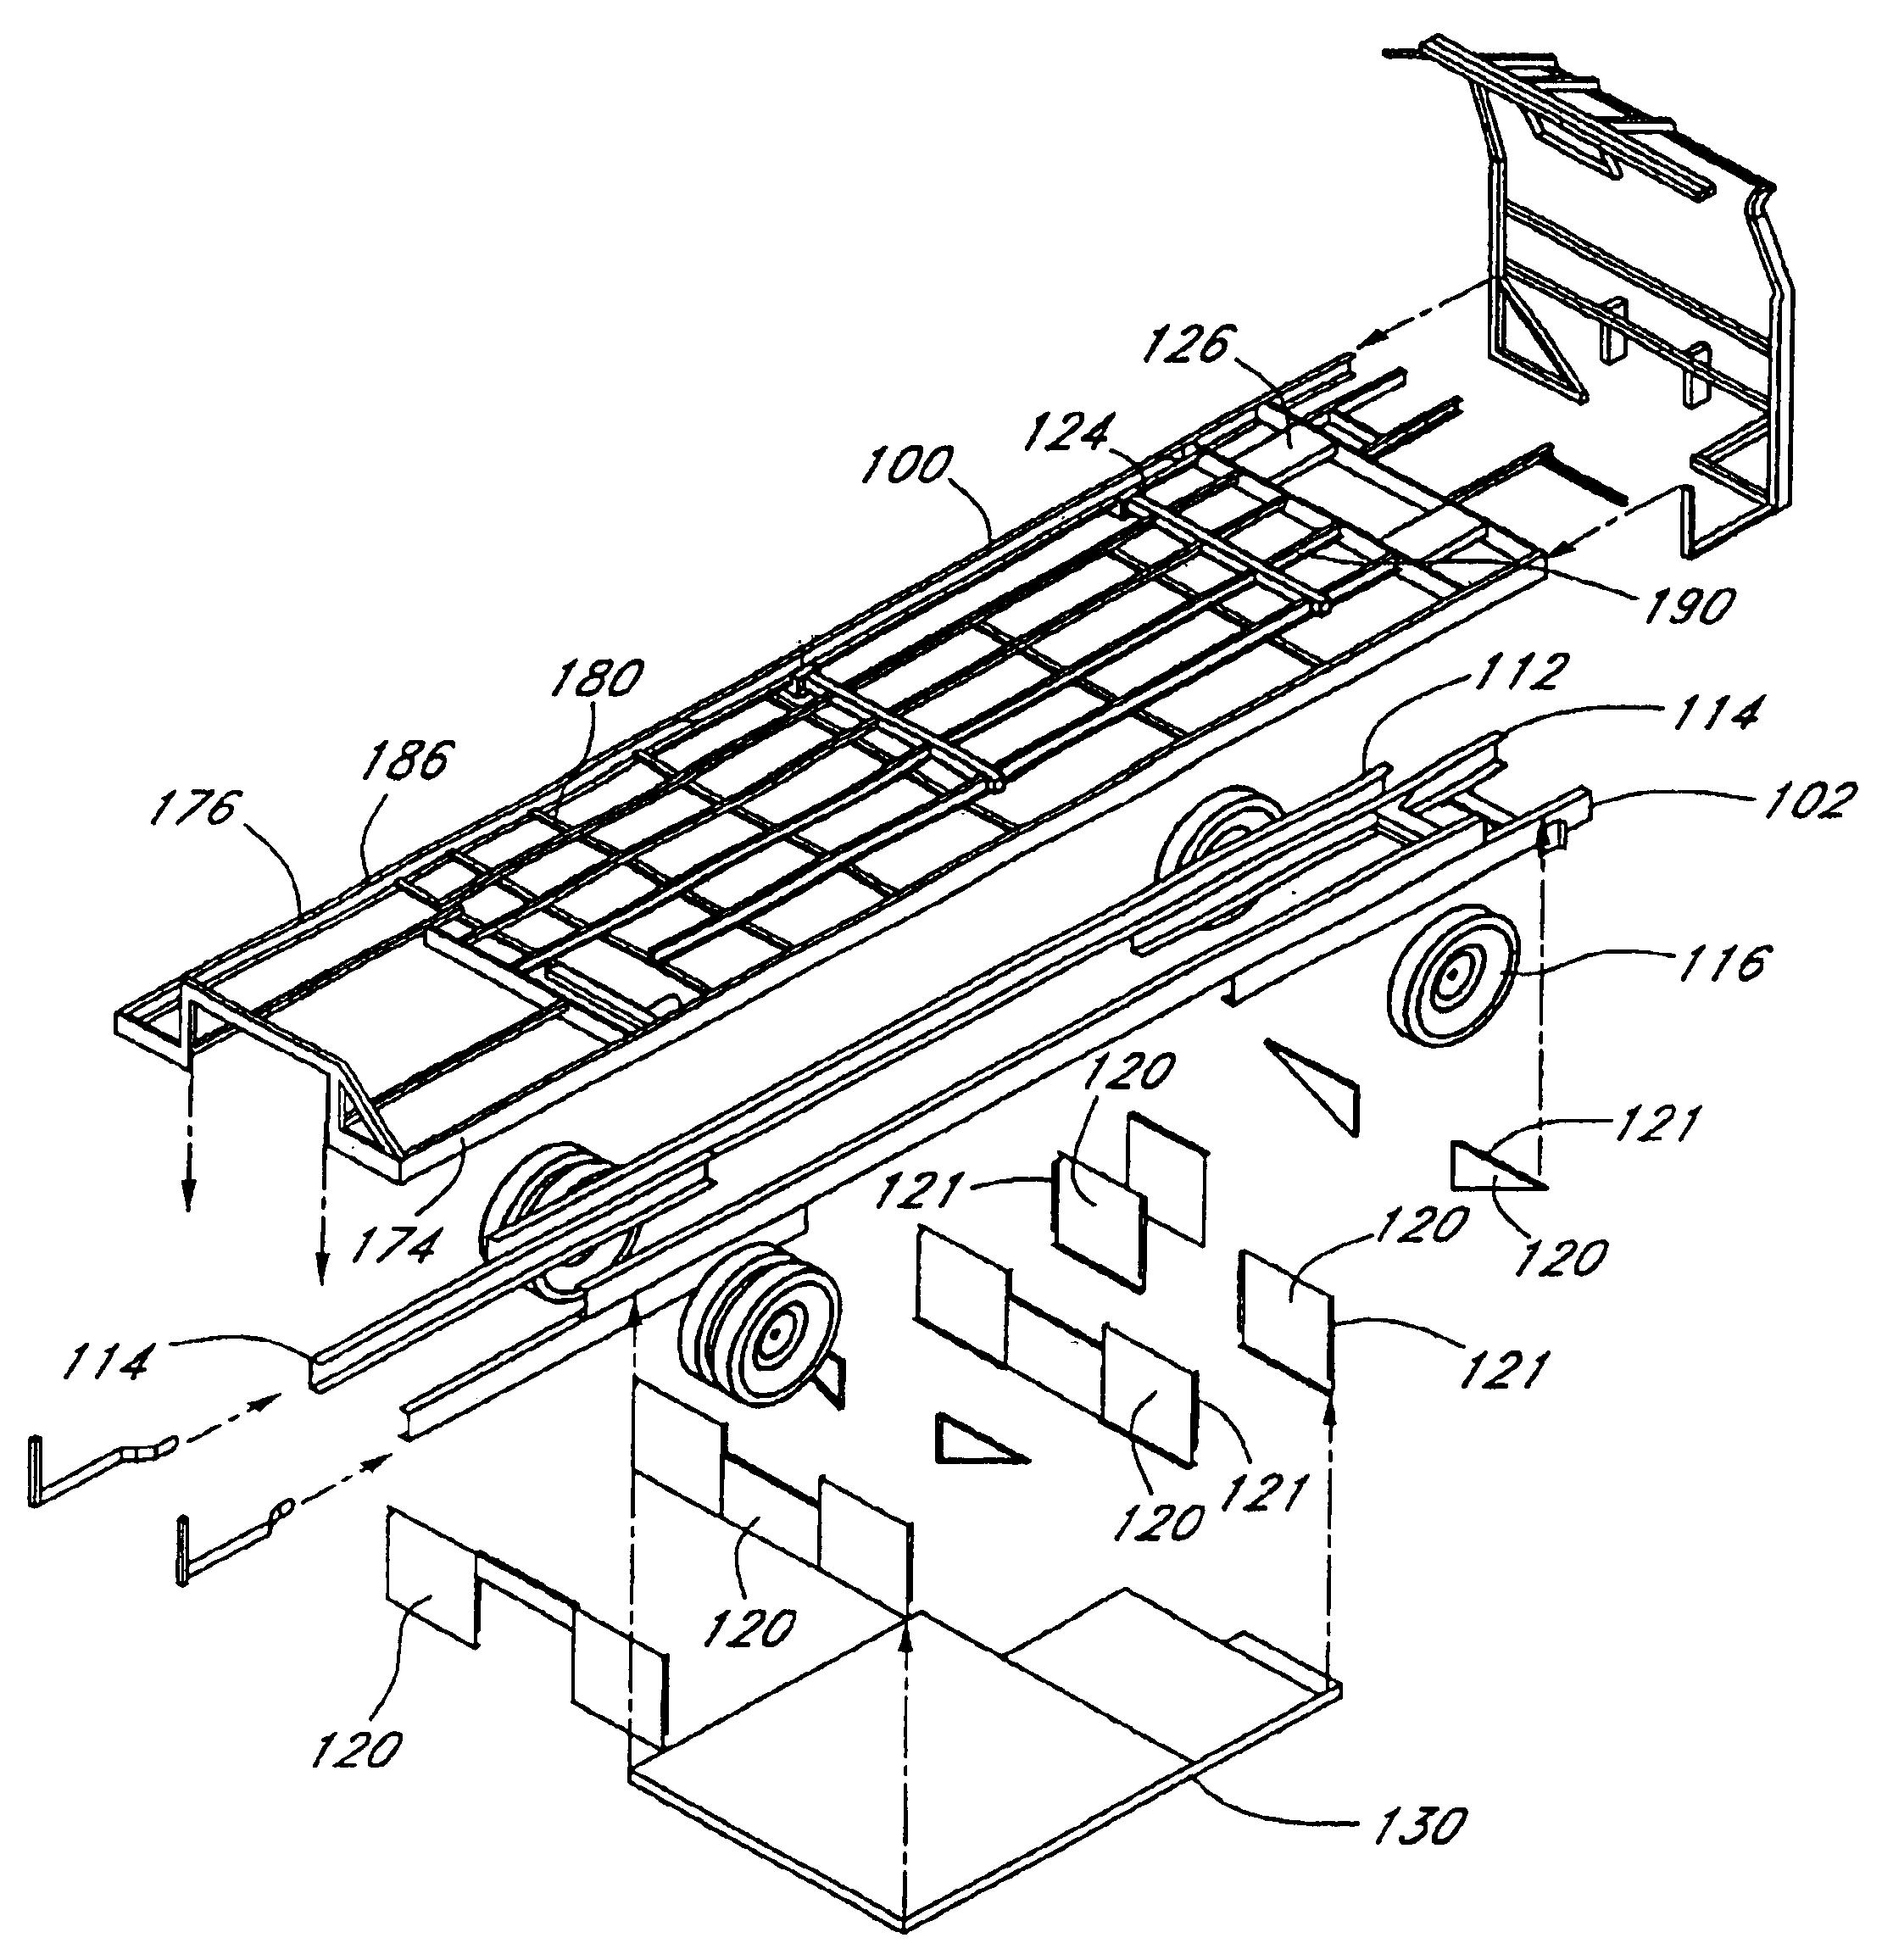 patent stickers